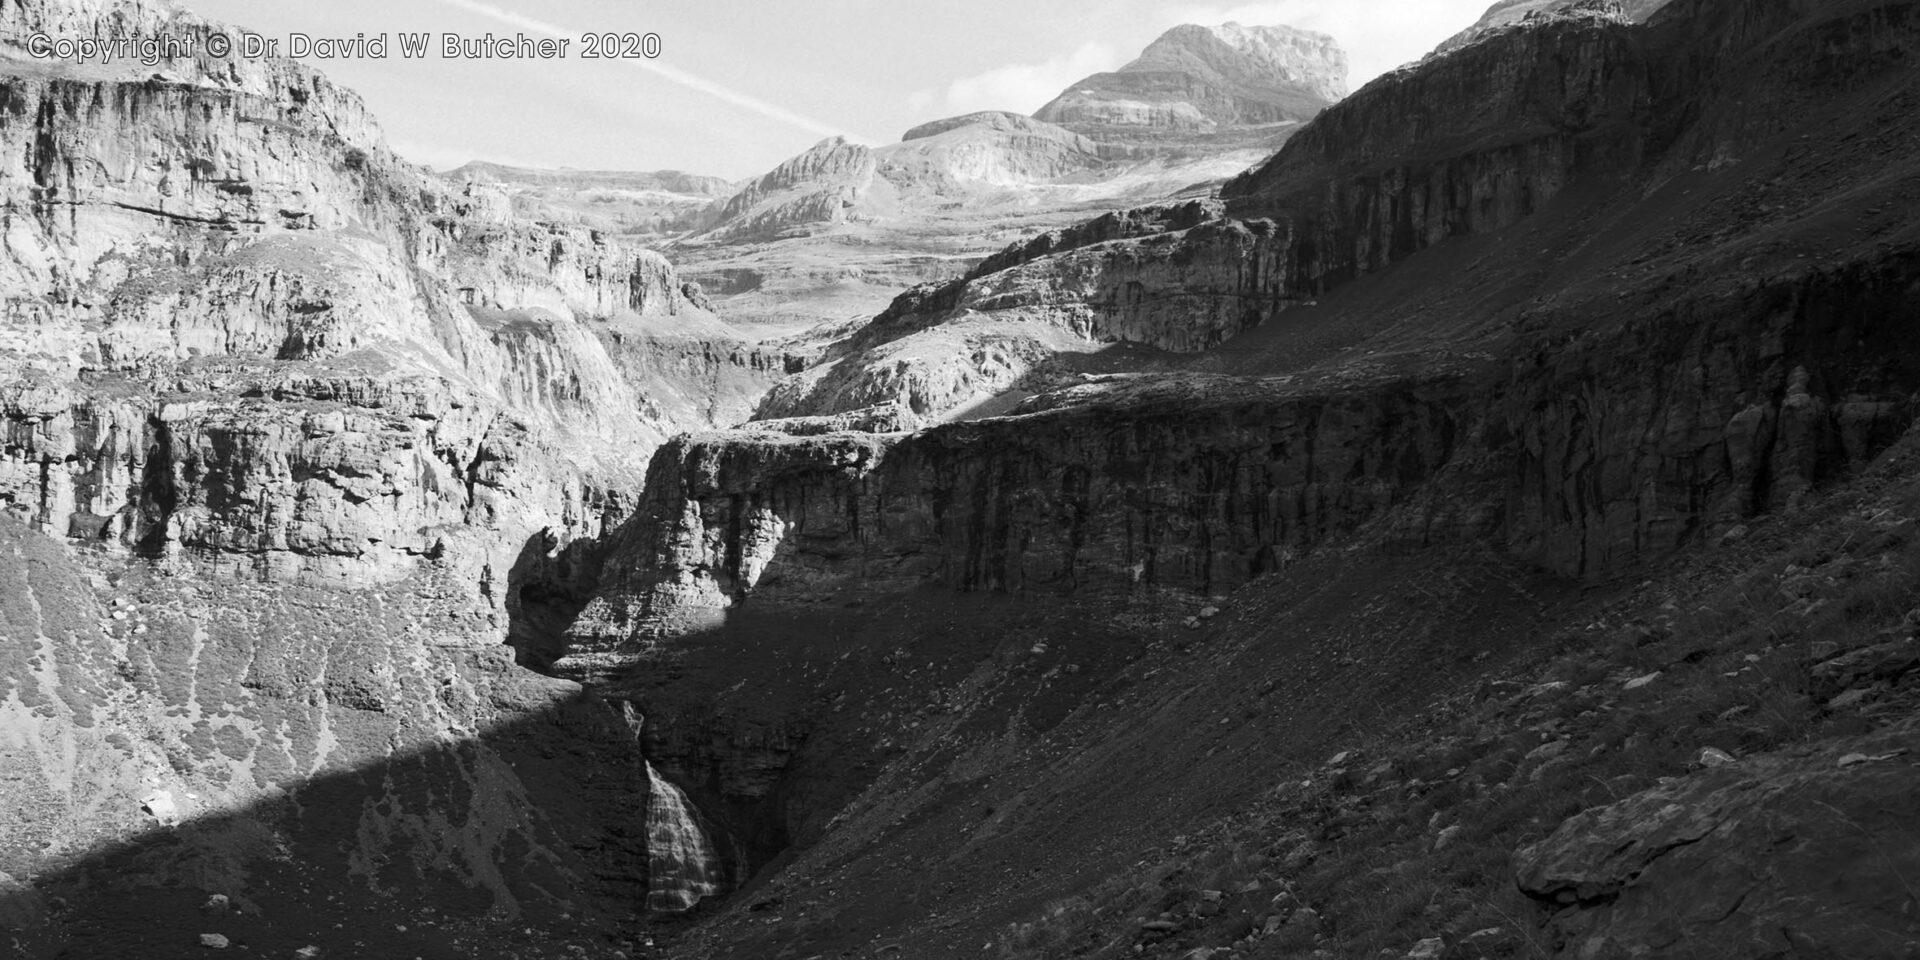 Ordesa Gorge and Mares Tail Falls, Torla, Pyrenees